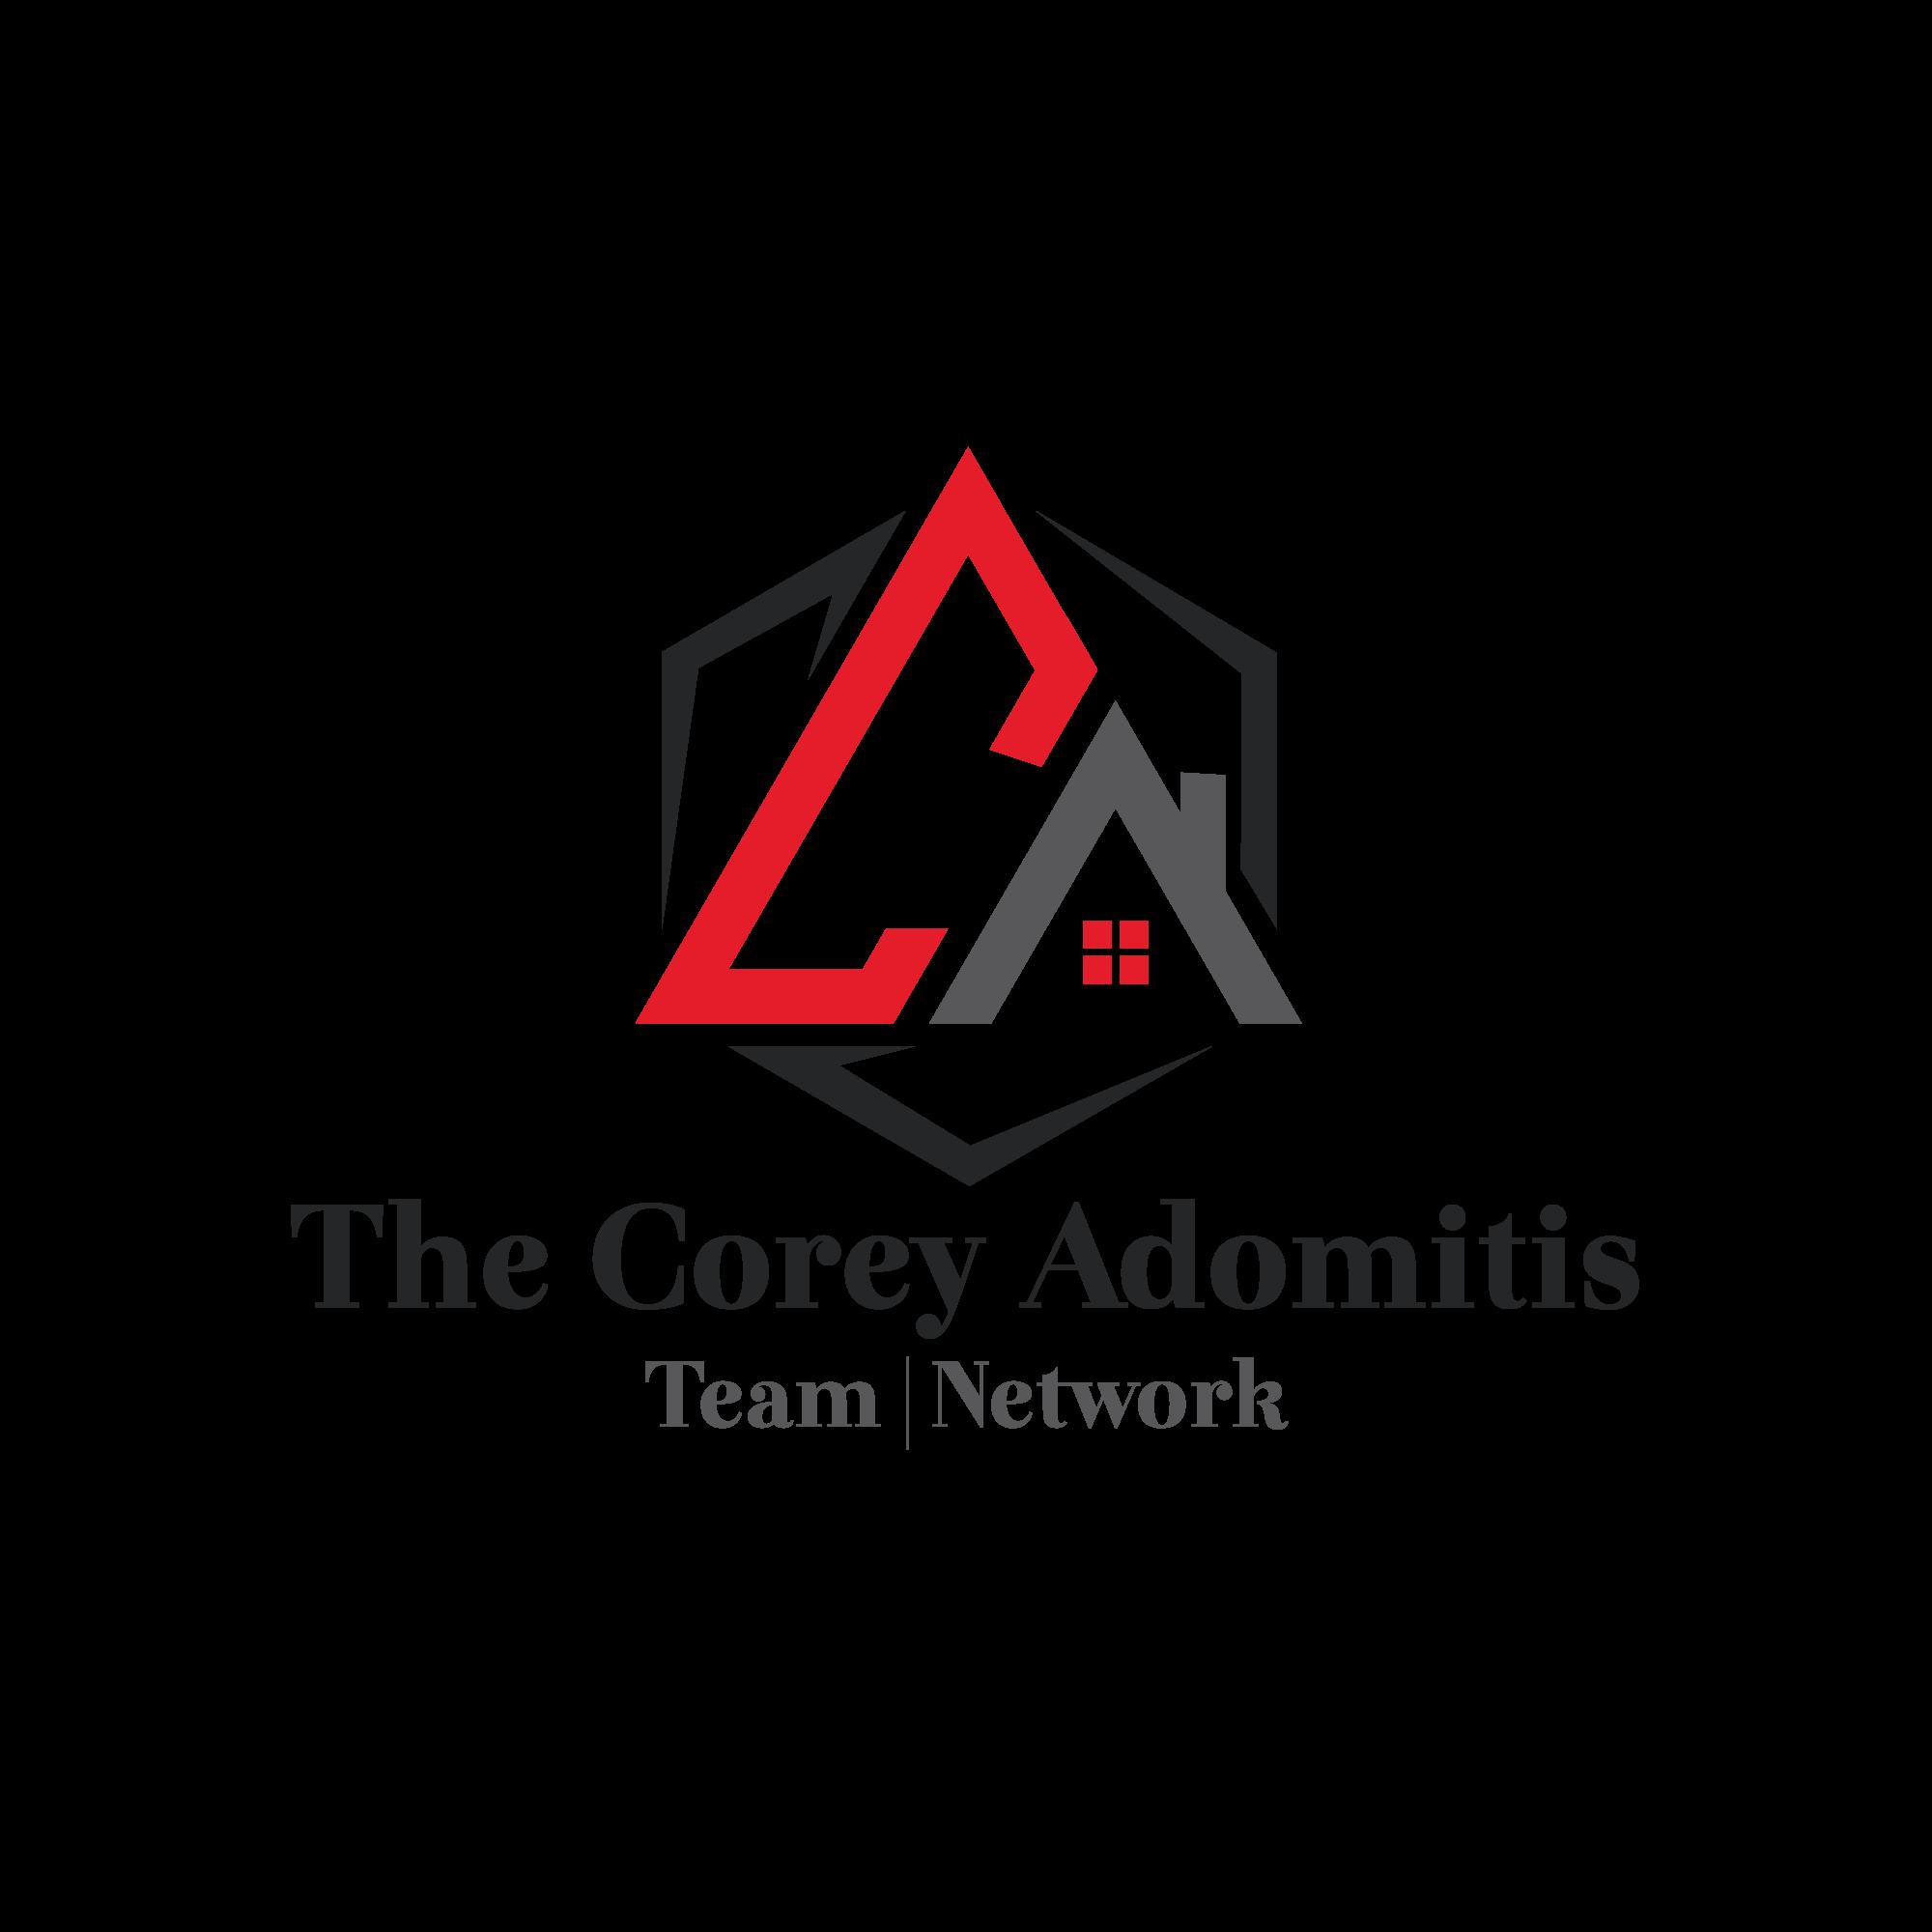 The Corey Adomitis Team logo